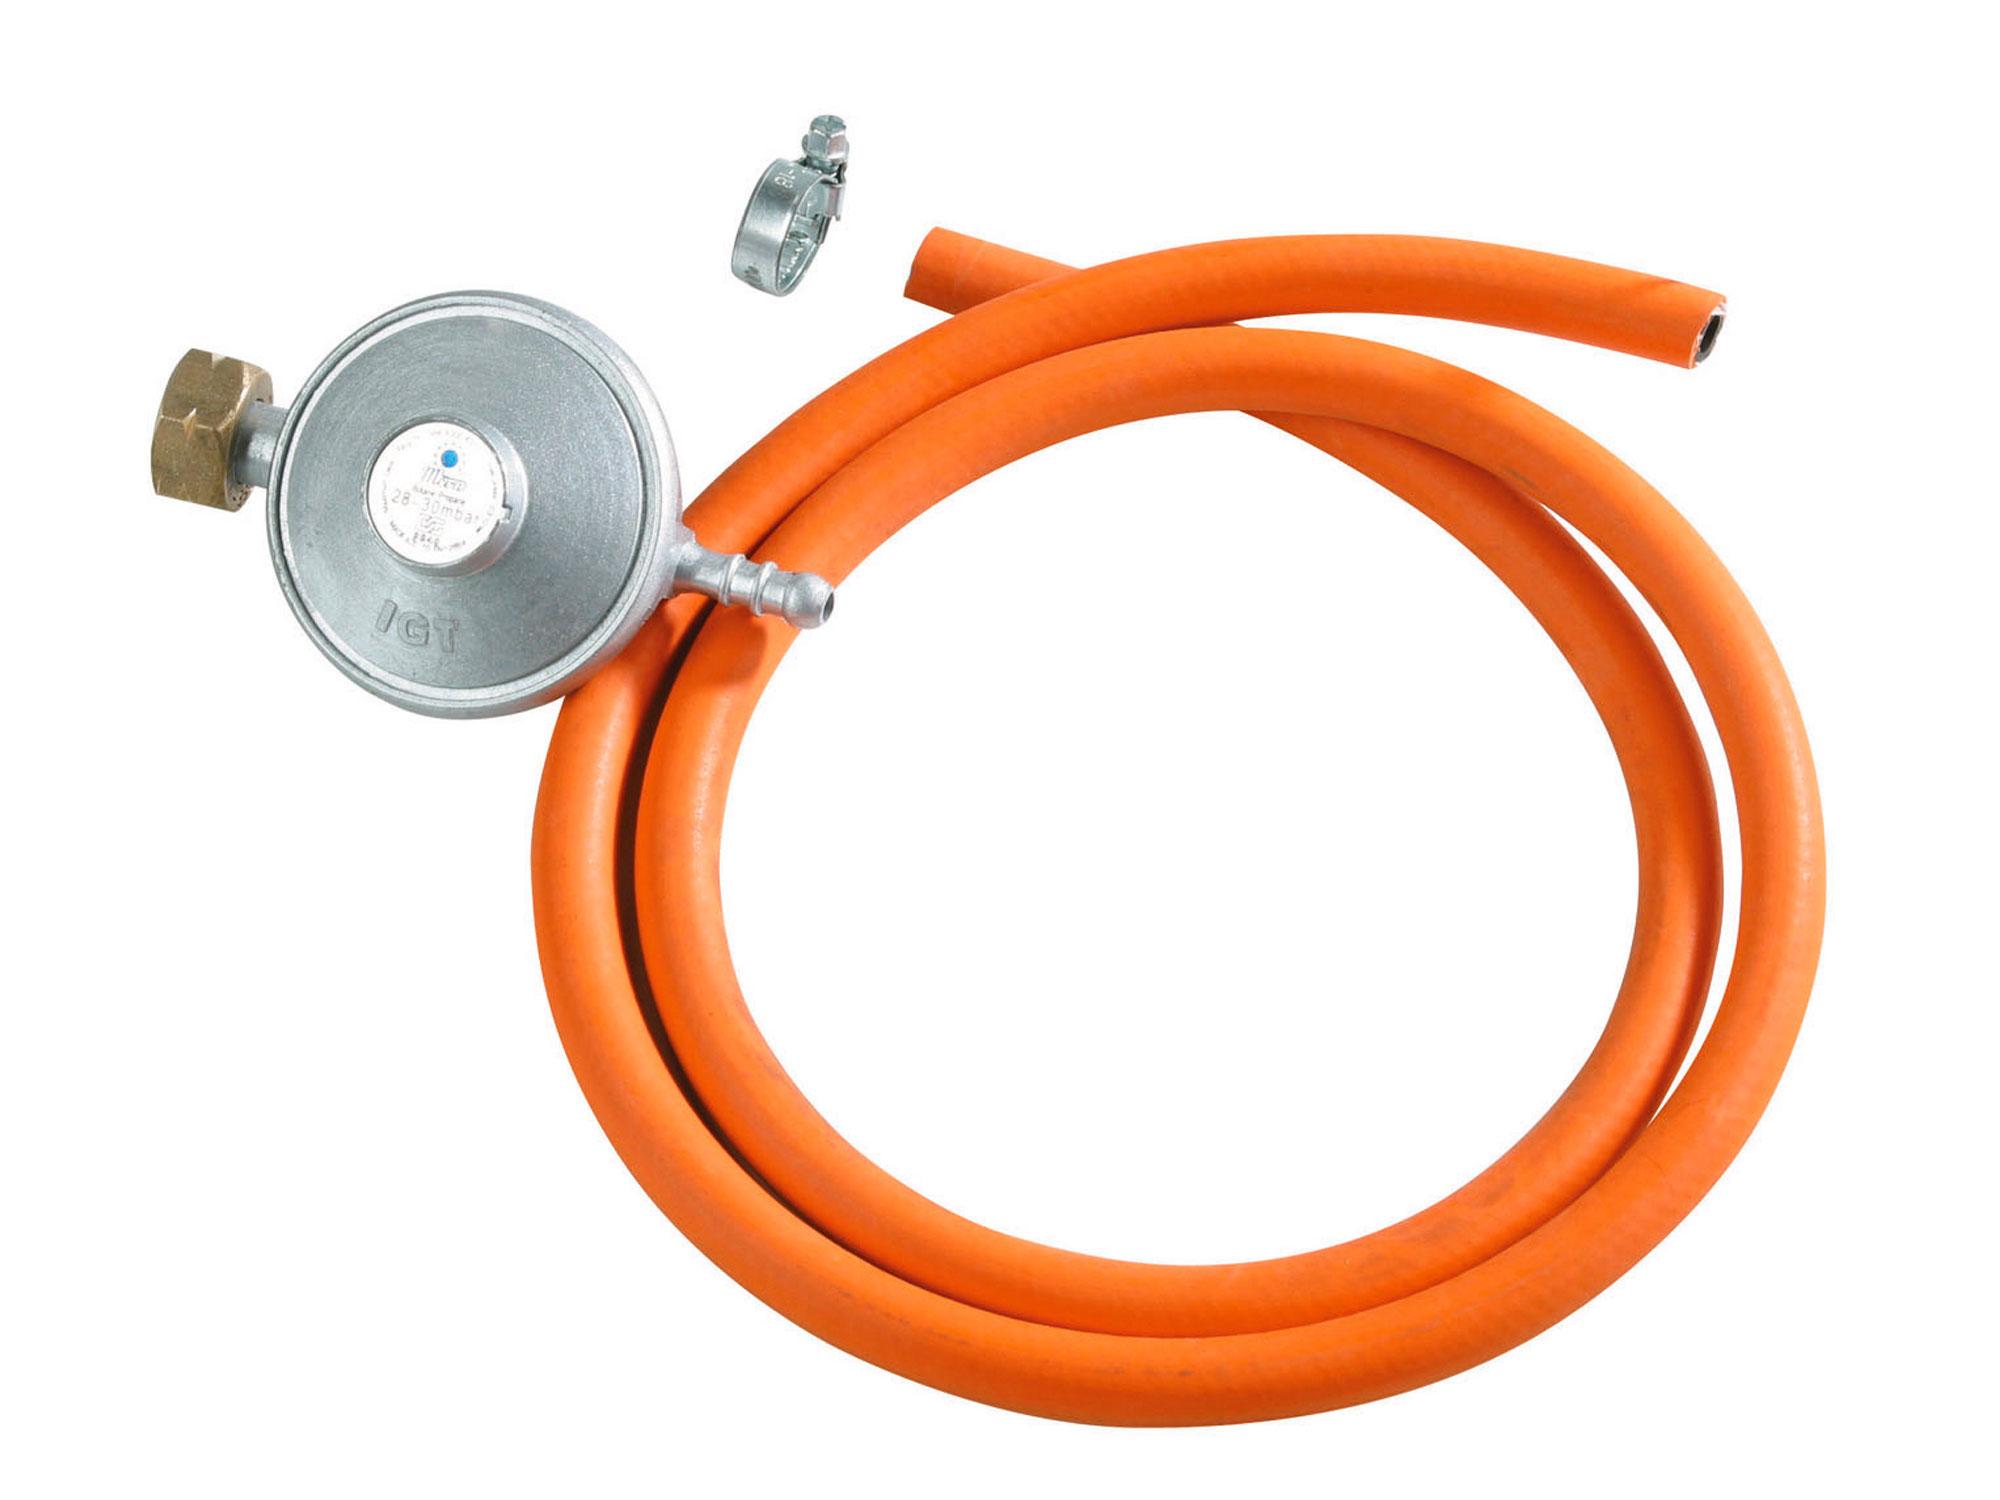 regulátor tlaku s hadicí, 30mbar (3kPa) s hadicí